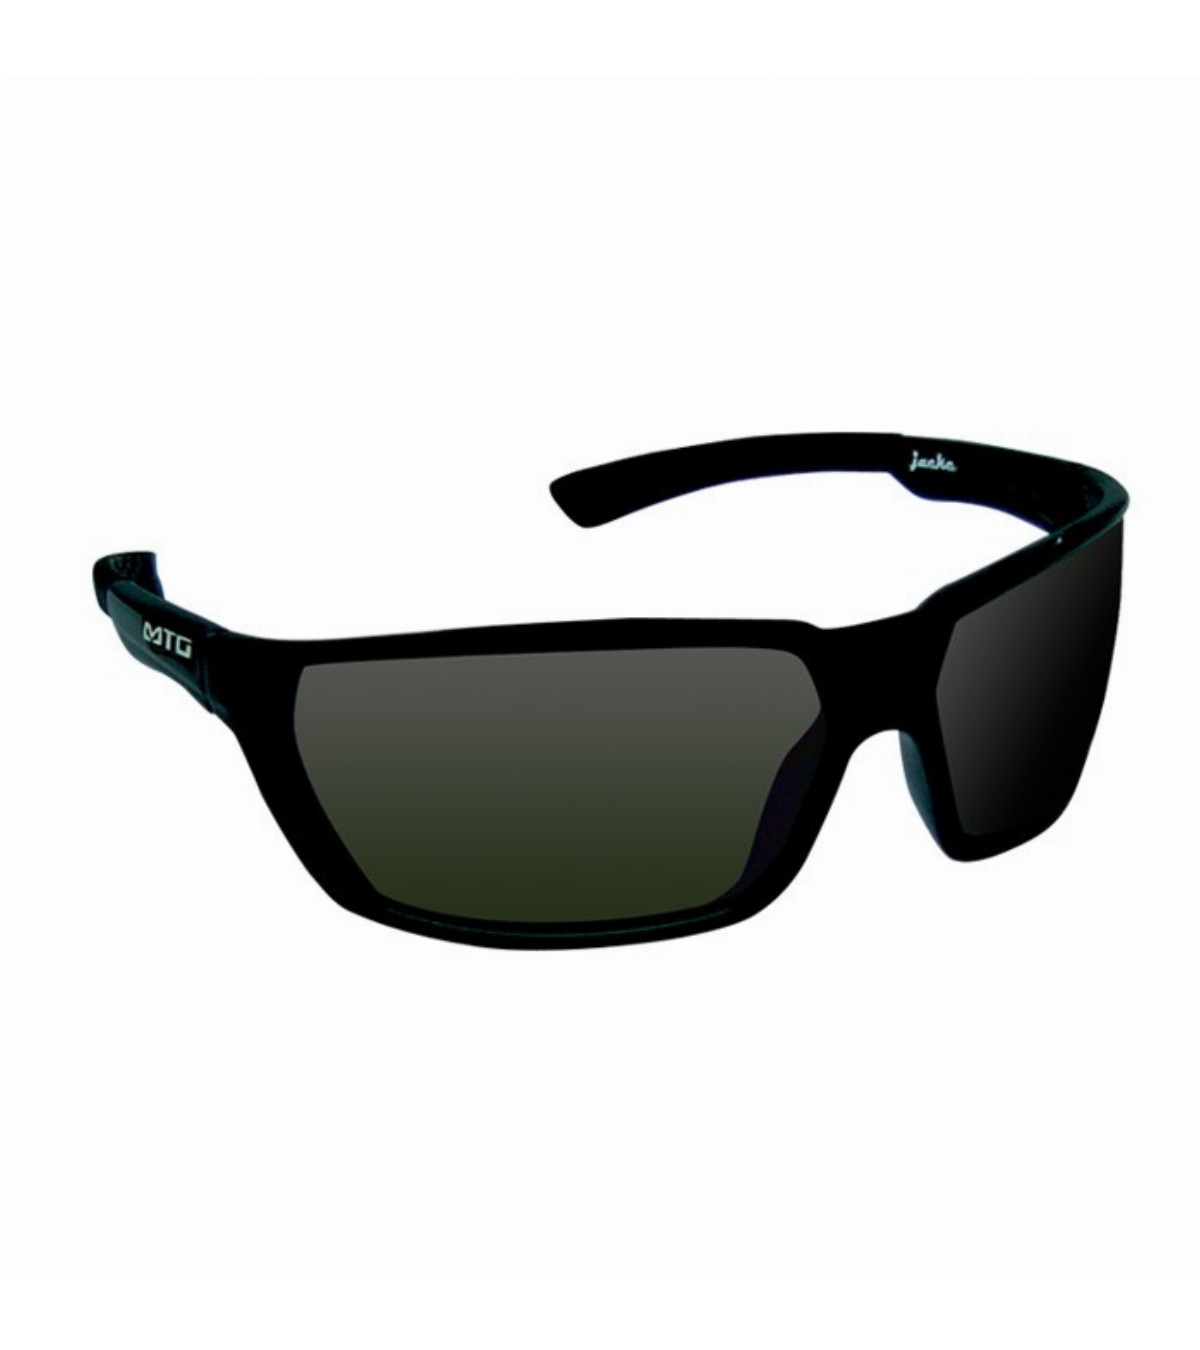 f6c14f4ab3 Montagne: gafas hombres, anteojos para hombres, gafas de sol hombre ...